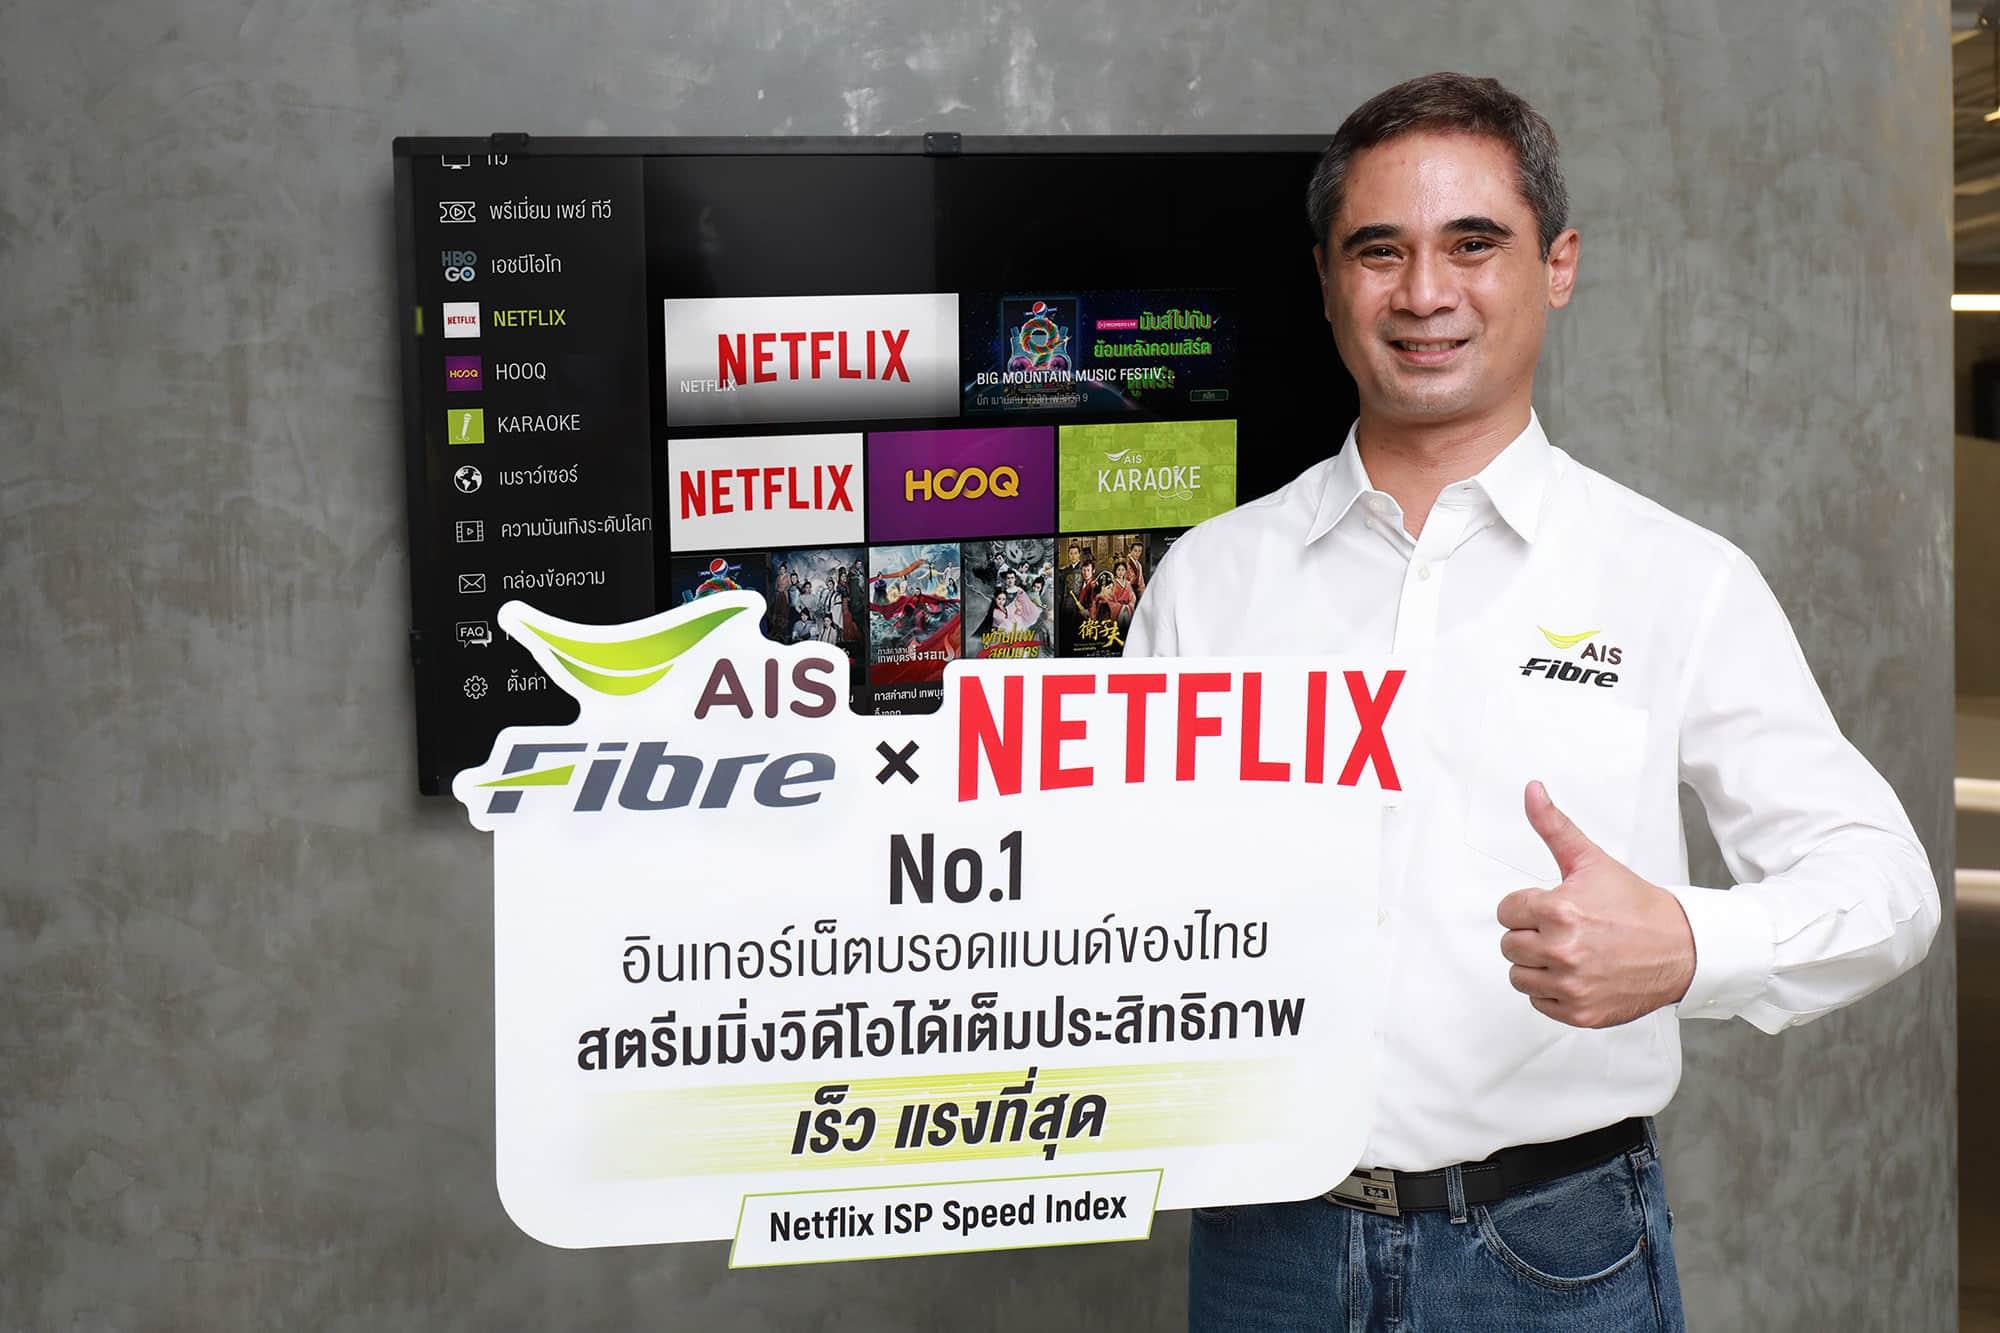 190205 Pic AIS Fibre xNetflix - AIS Fibre จับมือ Netflix ให้ลูกค้ารับชมคอนเทนต์ Netflix ผ่านกล่อง AIS PLAYBOX